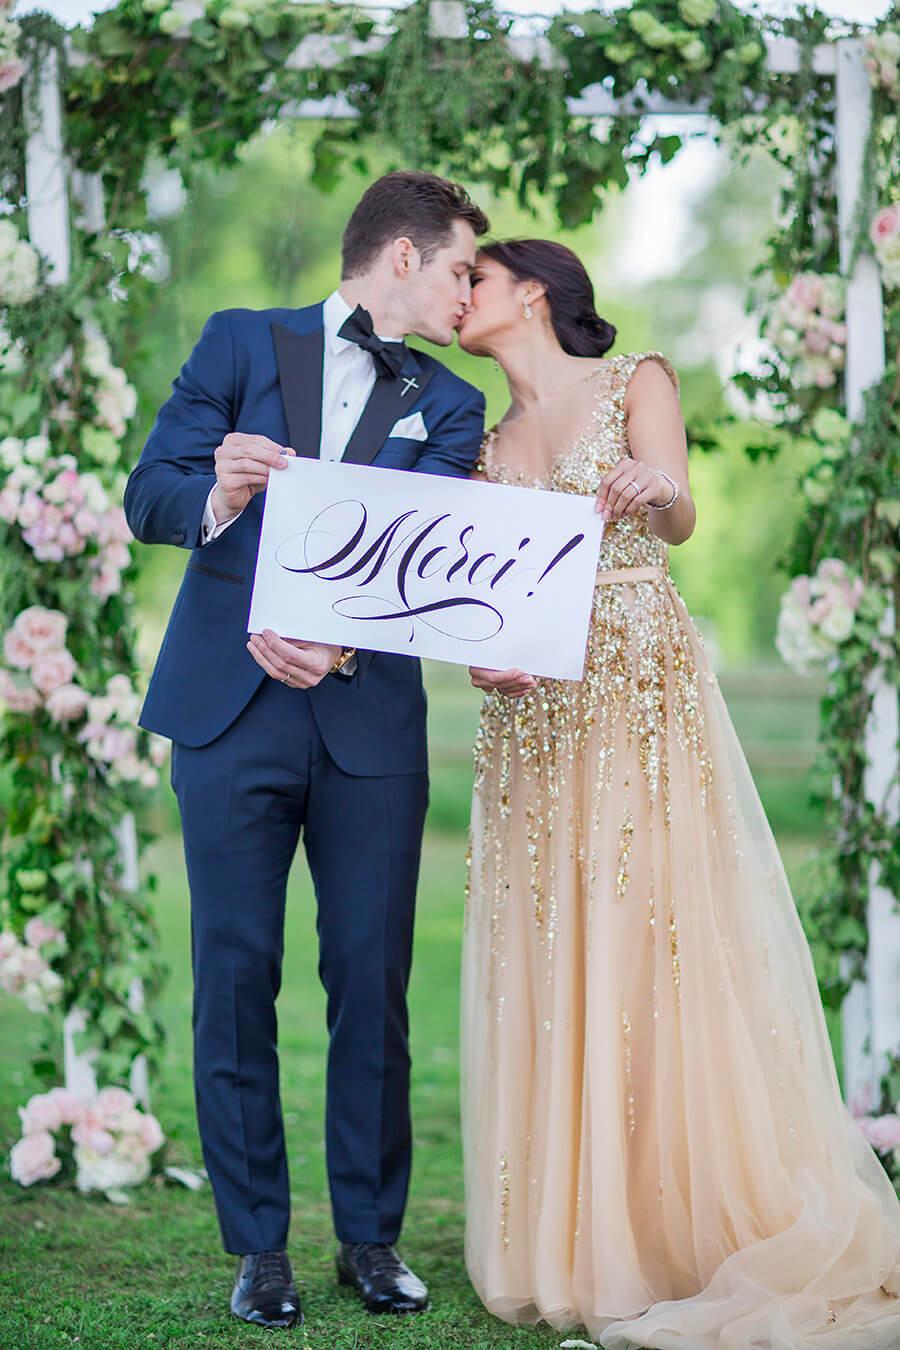 how-to-plan-a-destination-wedding-in-paris-france-desti-guide-to-destination-weddings-podcast-destipro-wedding-planner-fete-in-france-interview-3.jpg